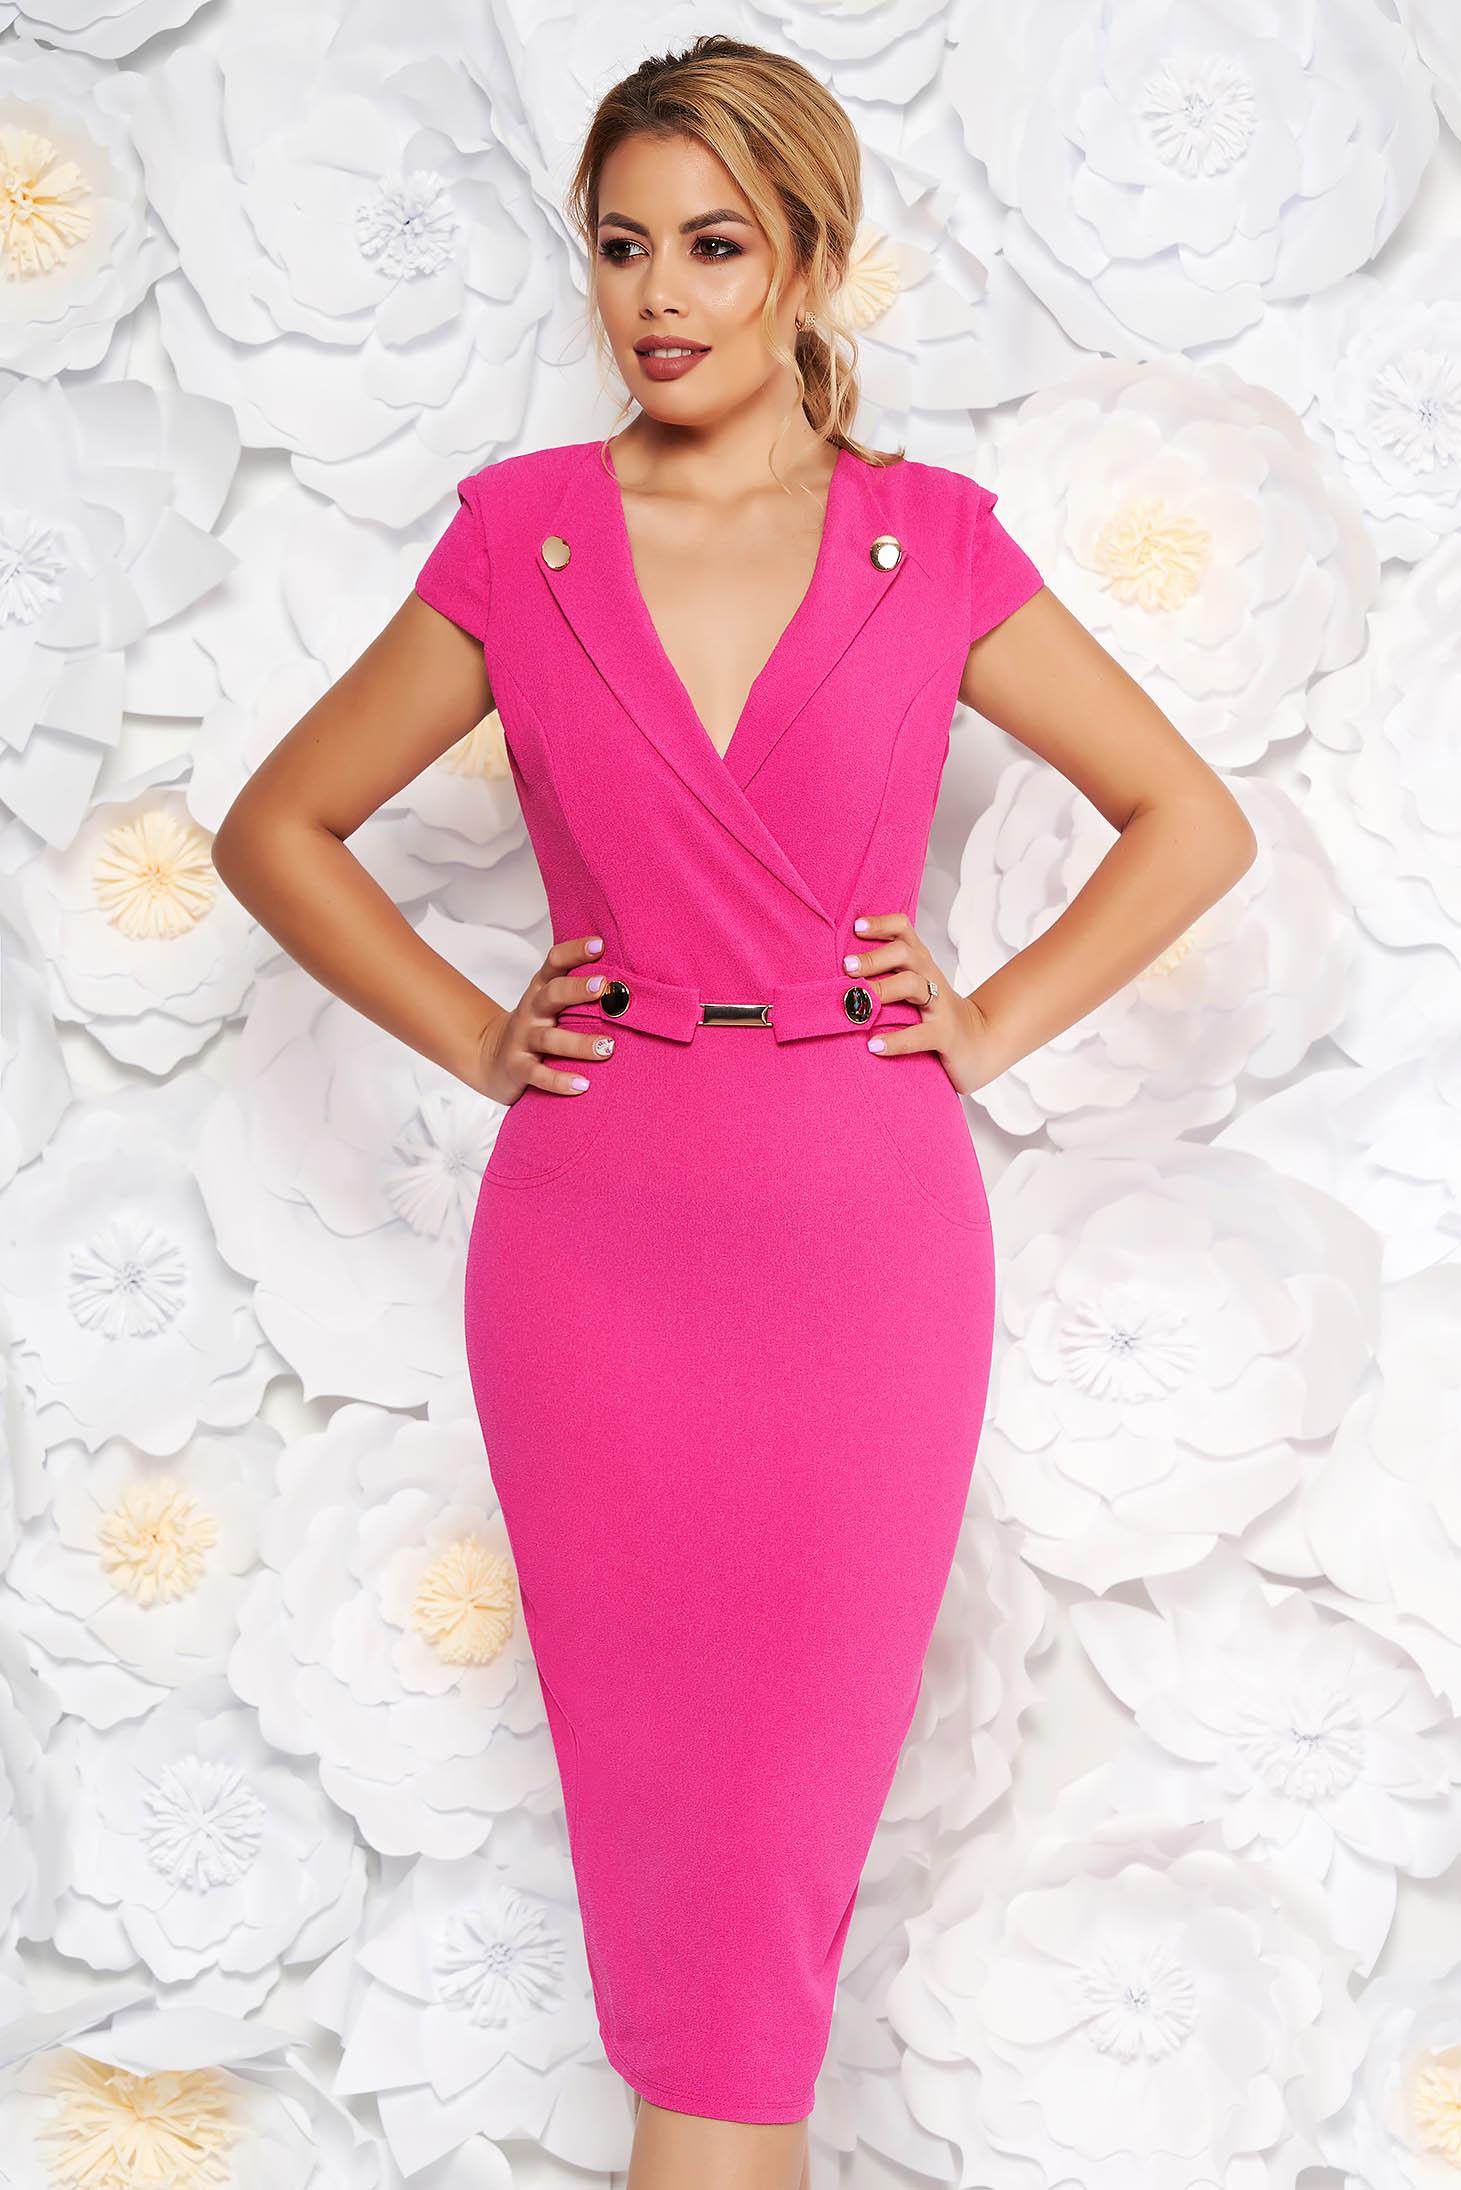 Rochie StarShinerS roz eleganta midi tip creion din scuba cu accesorii metalice